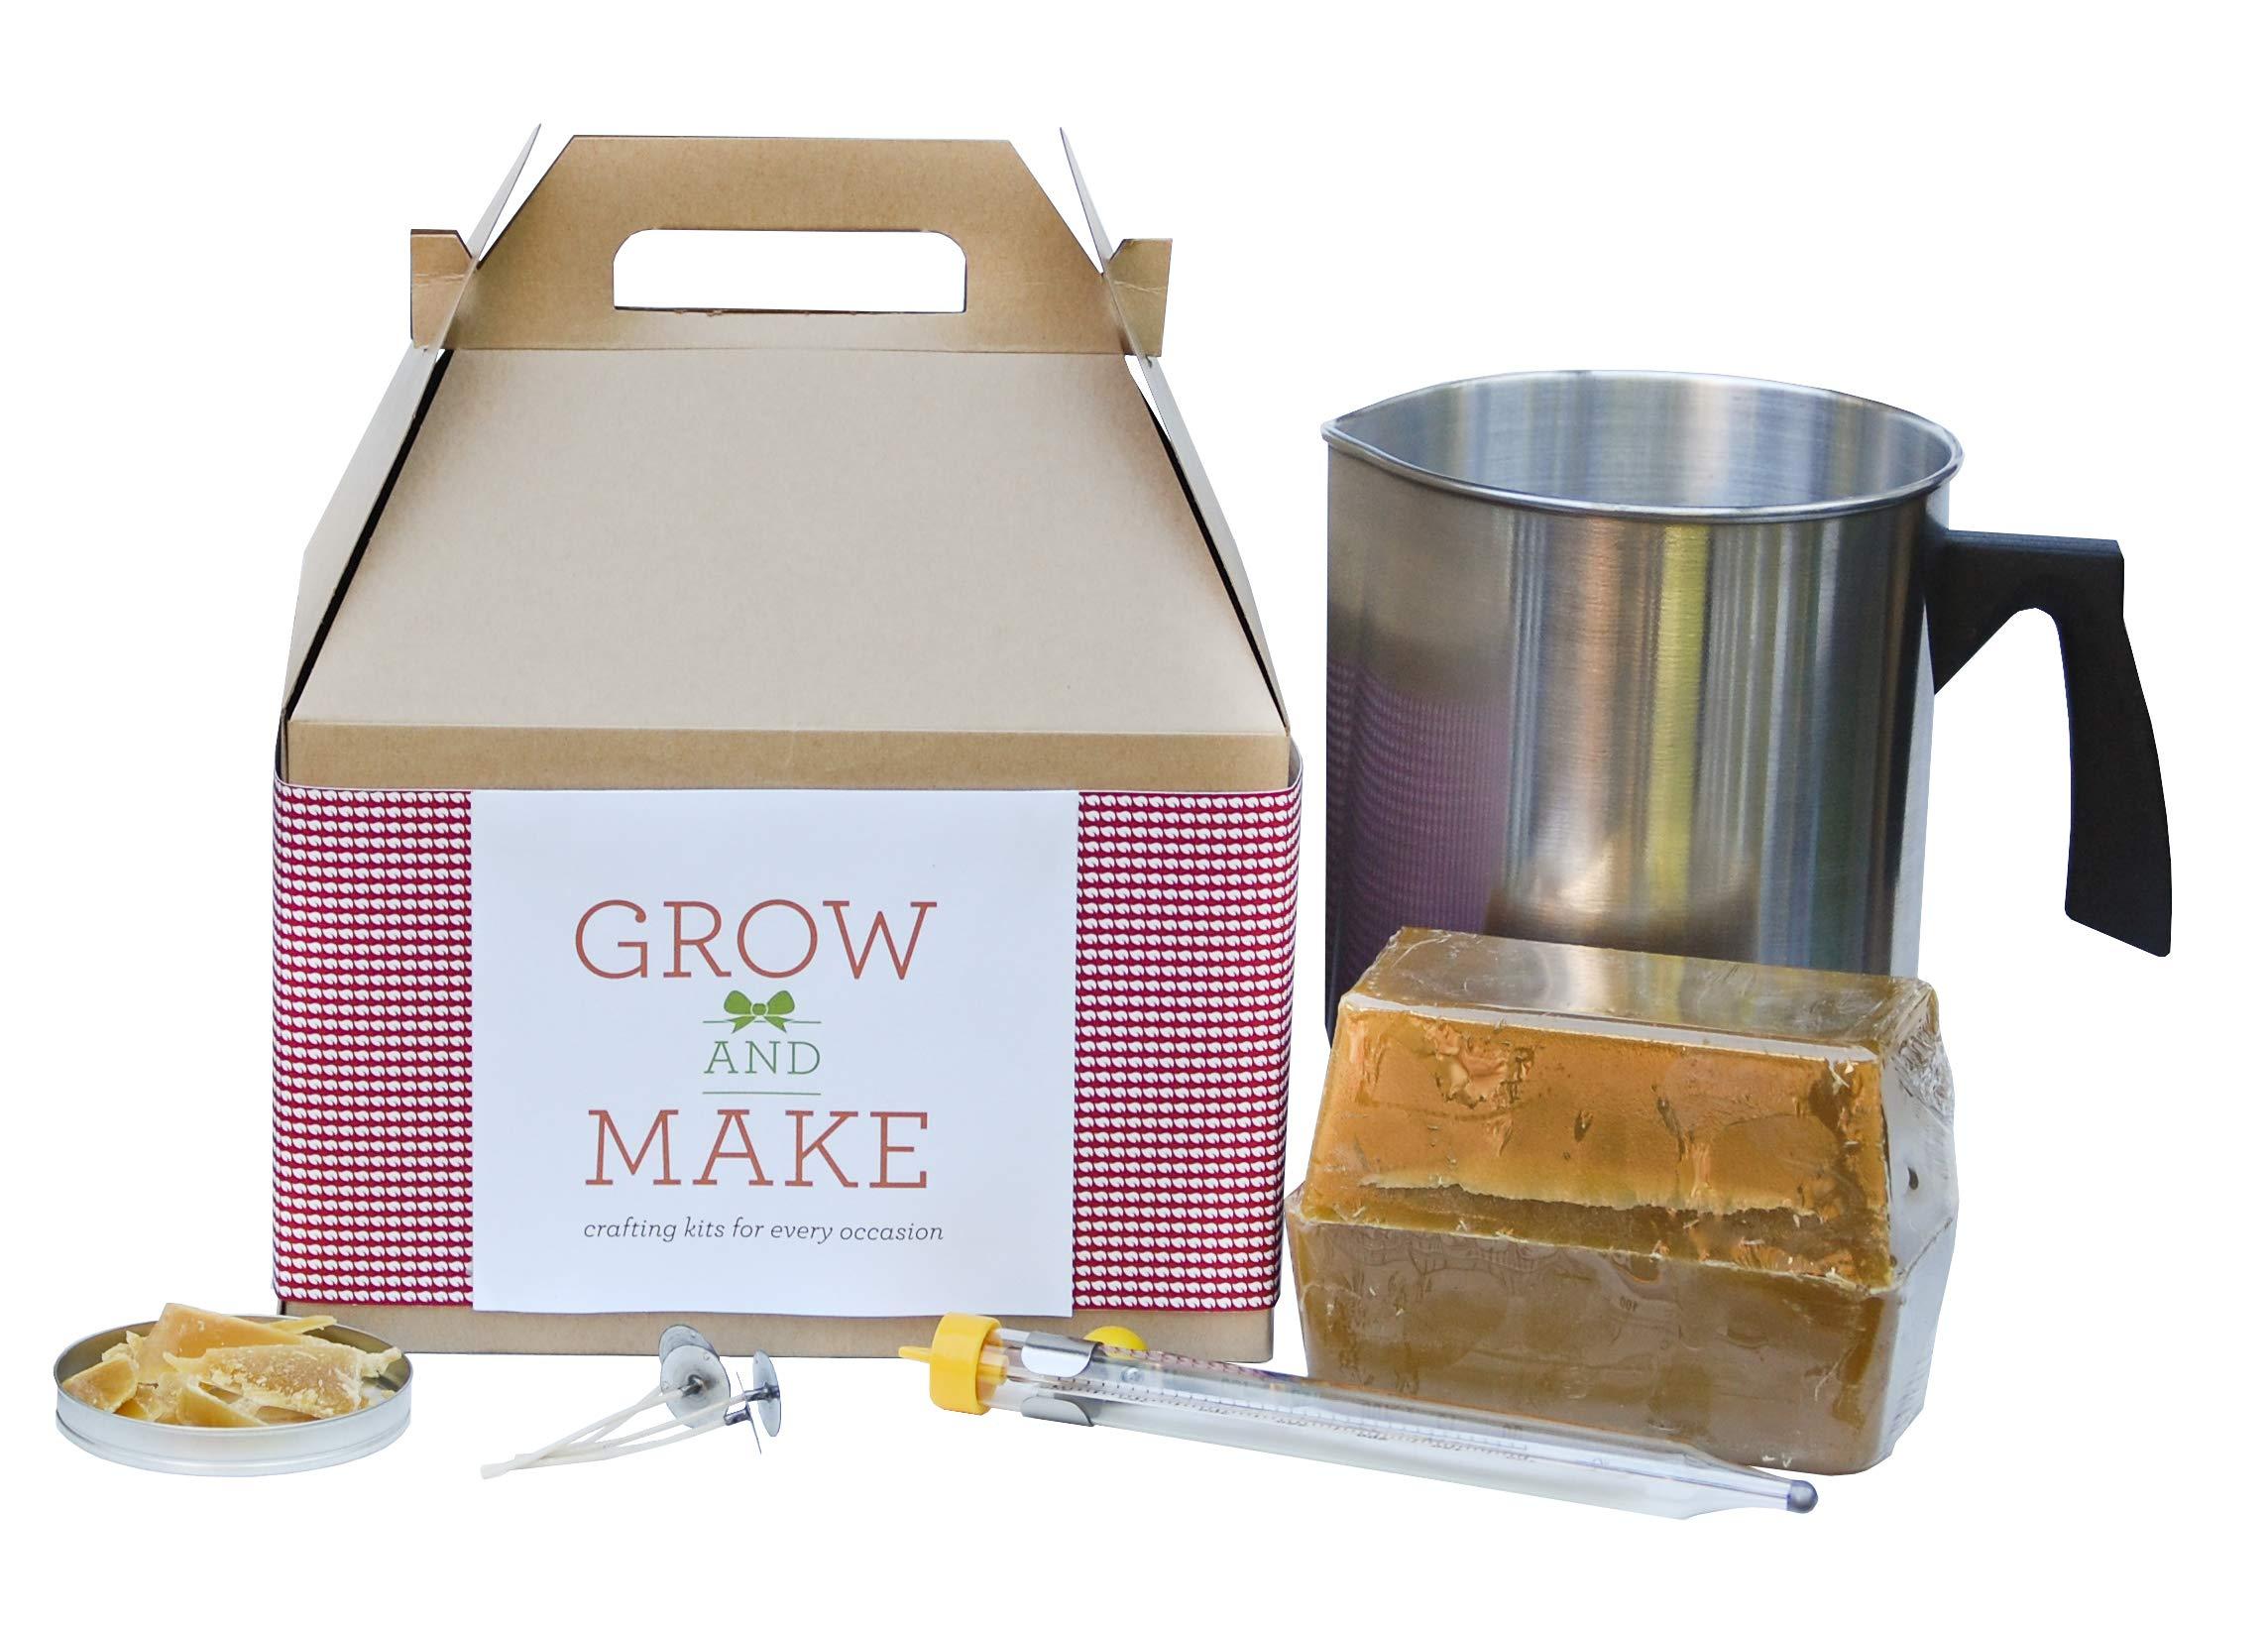 Grow and Make DIY Deluxe Beeswax Candle Making Kit - Make 6 Large Mason Jar Candles at home!